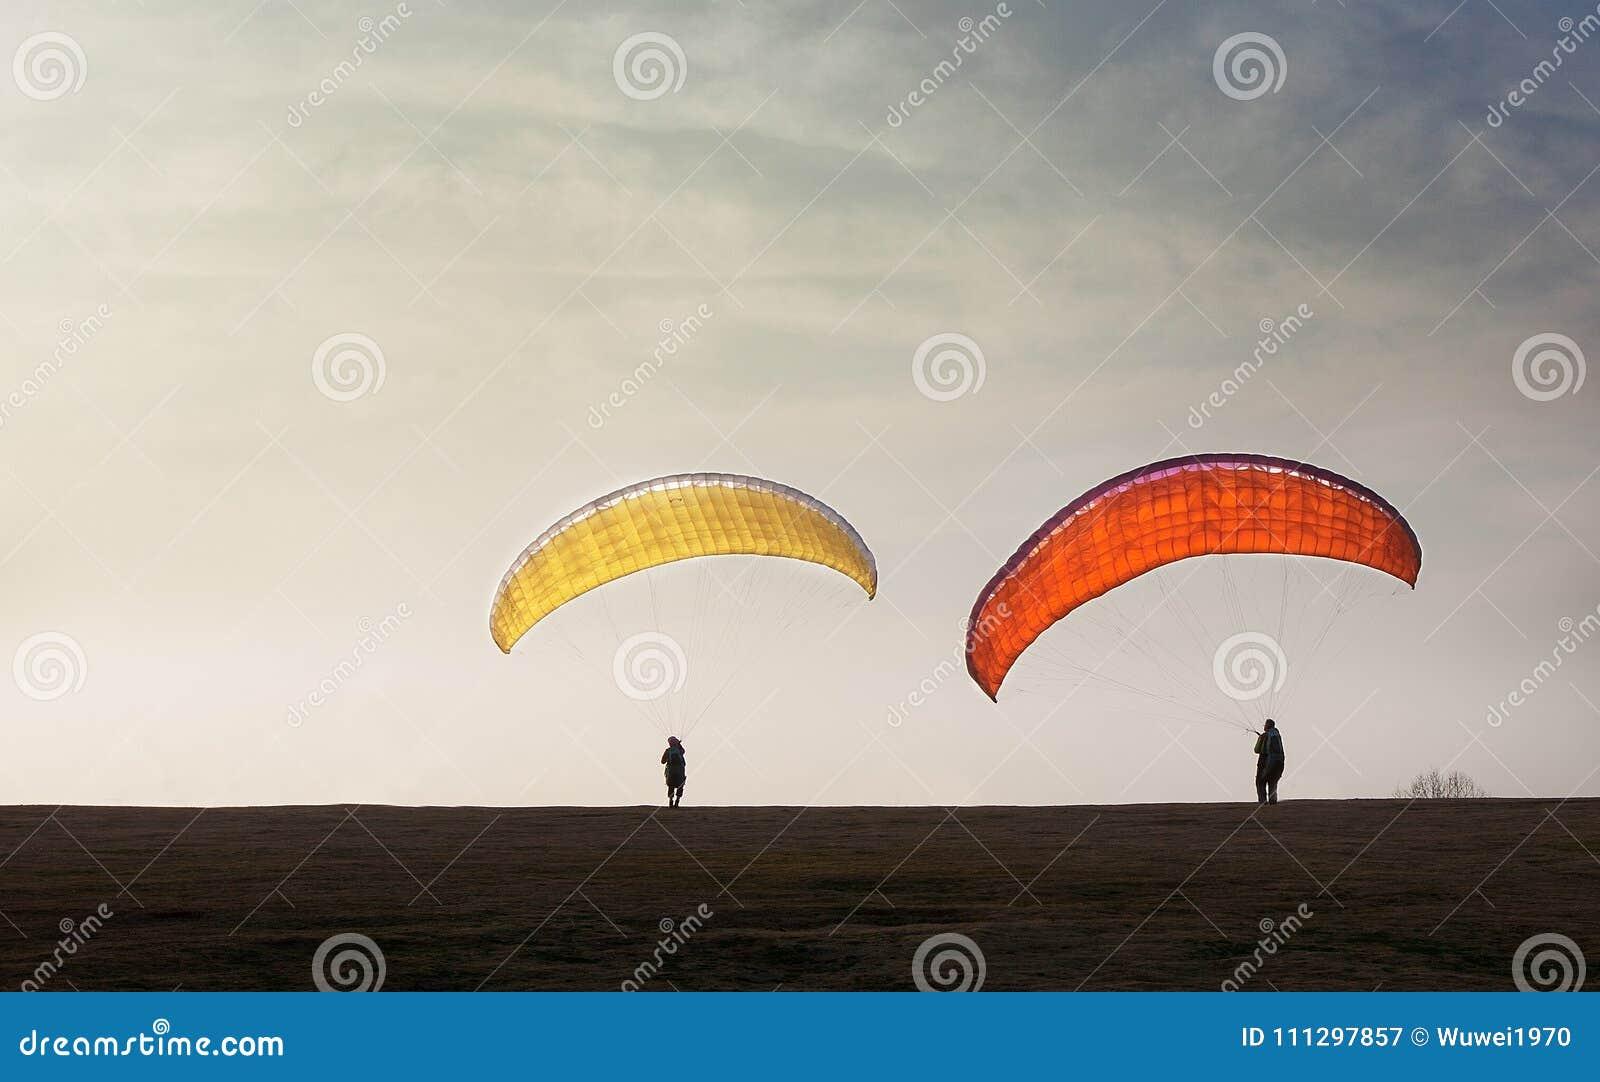 Gliding parachute stock image  Image of parachute, competitive